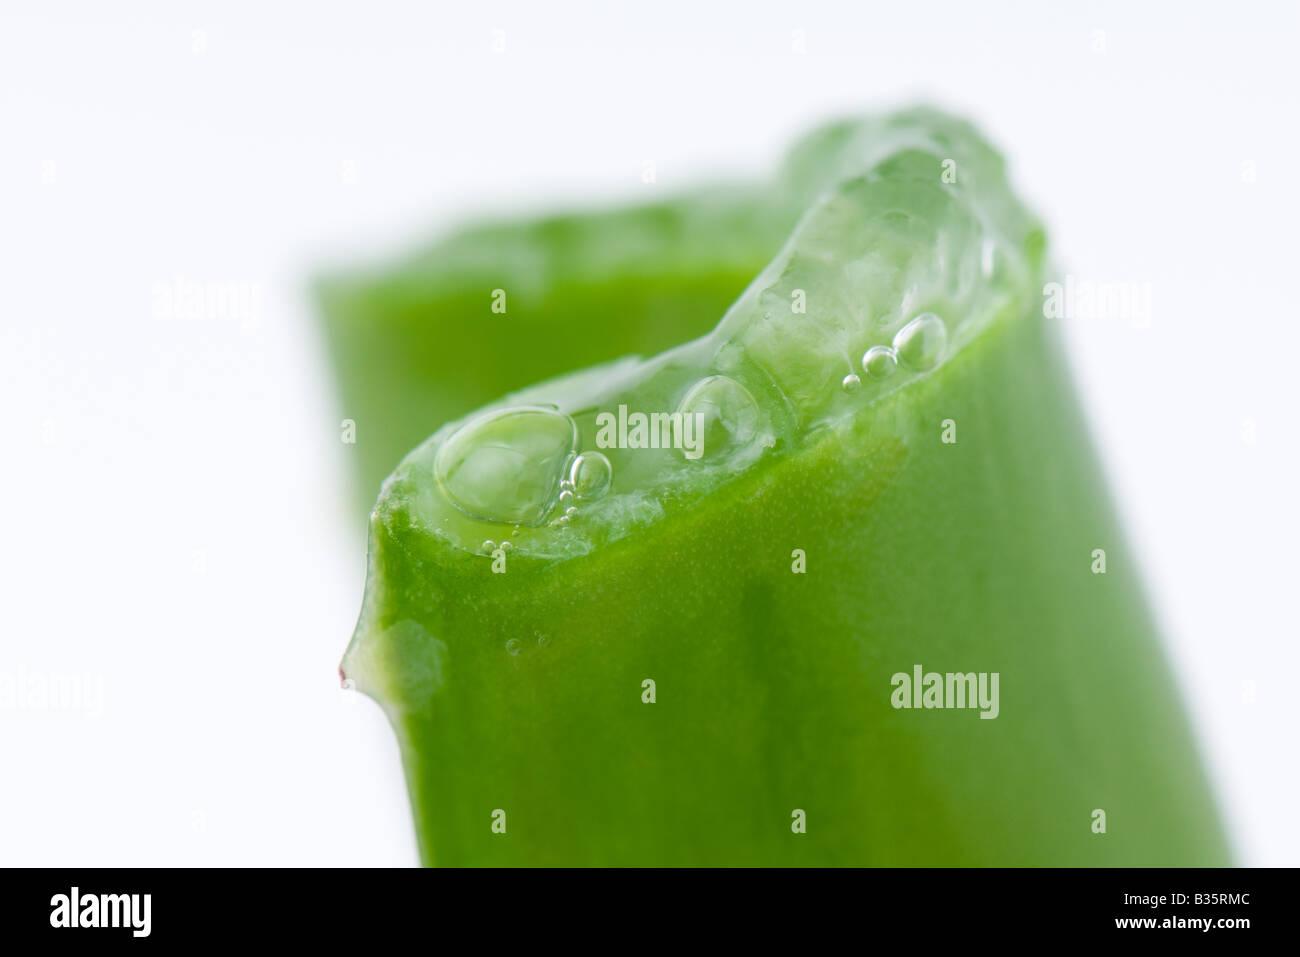 Aloe vera leaf and gel, close-up - Stock Image